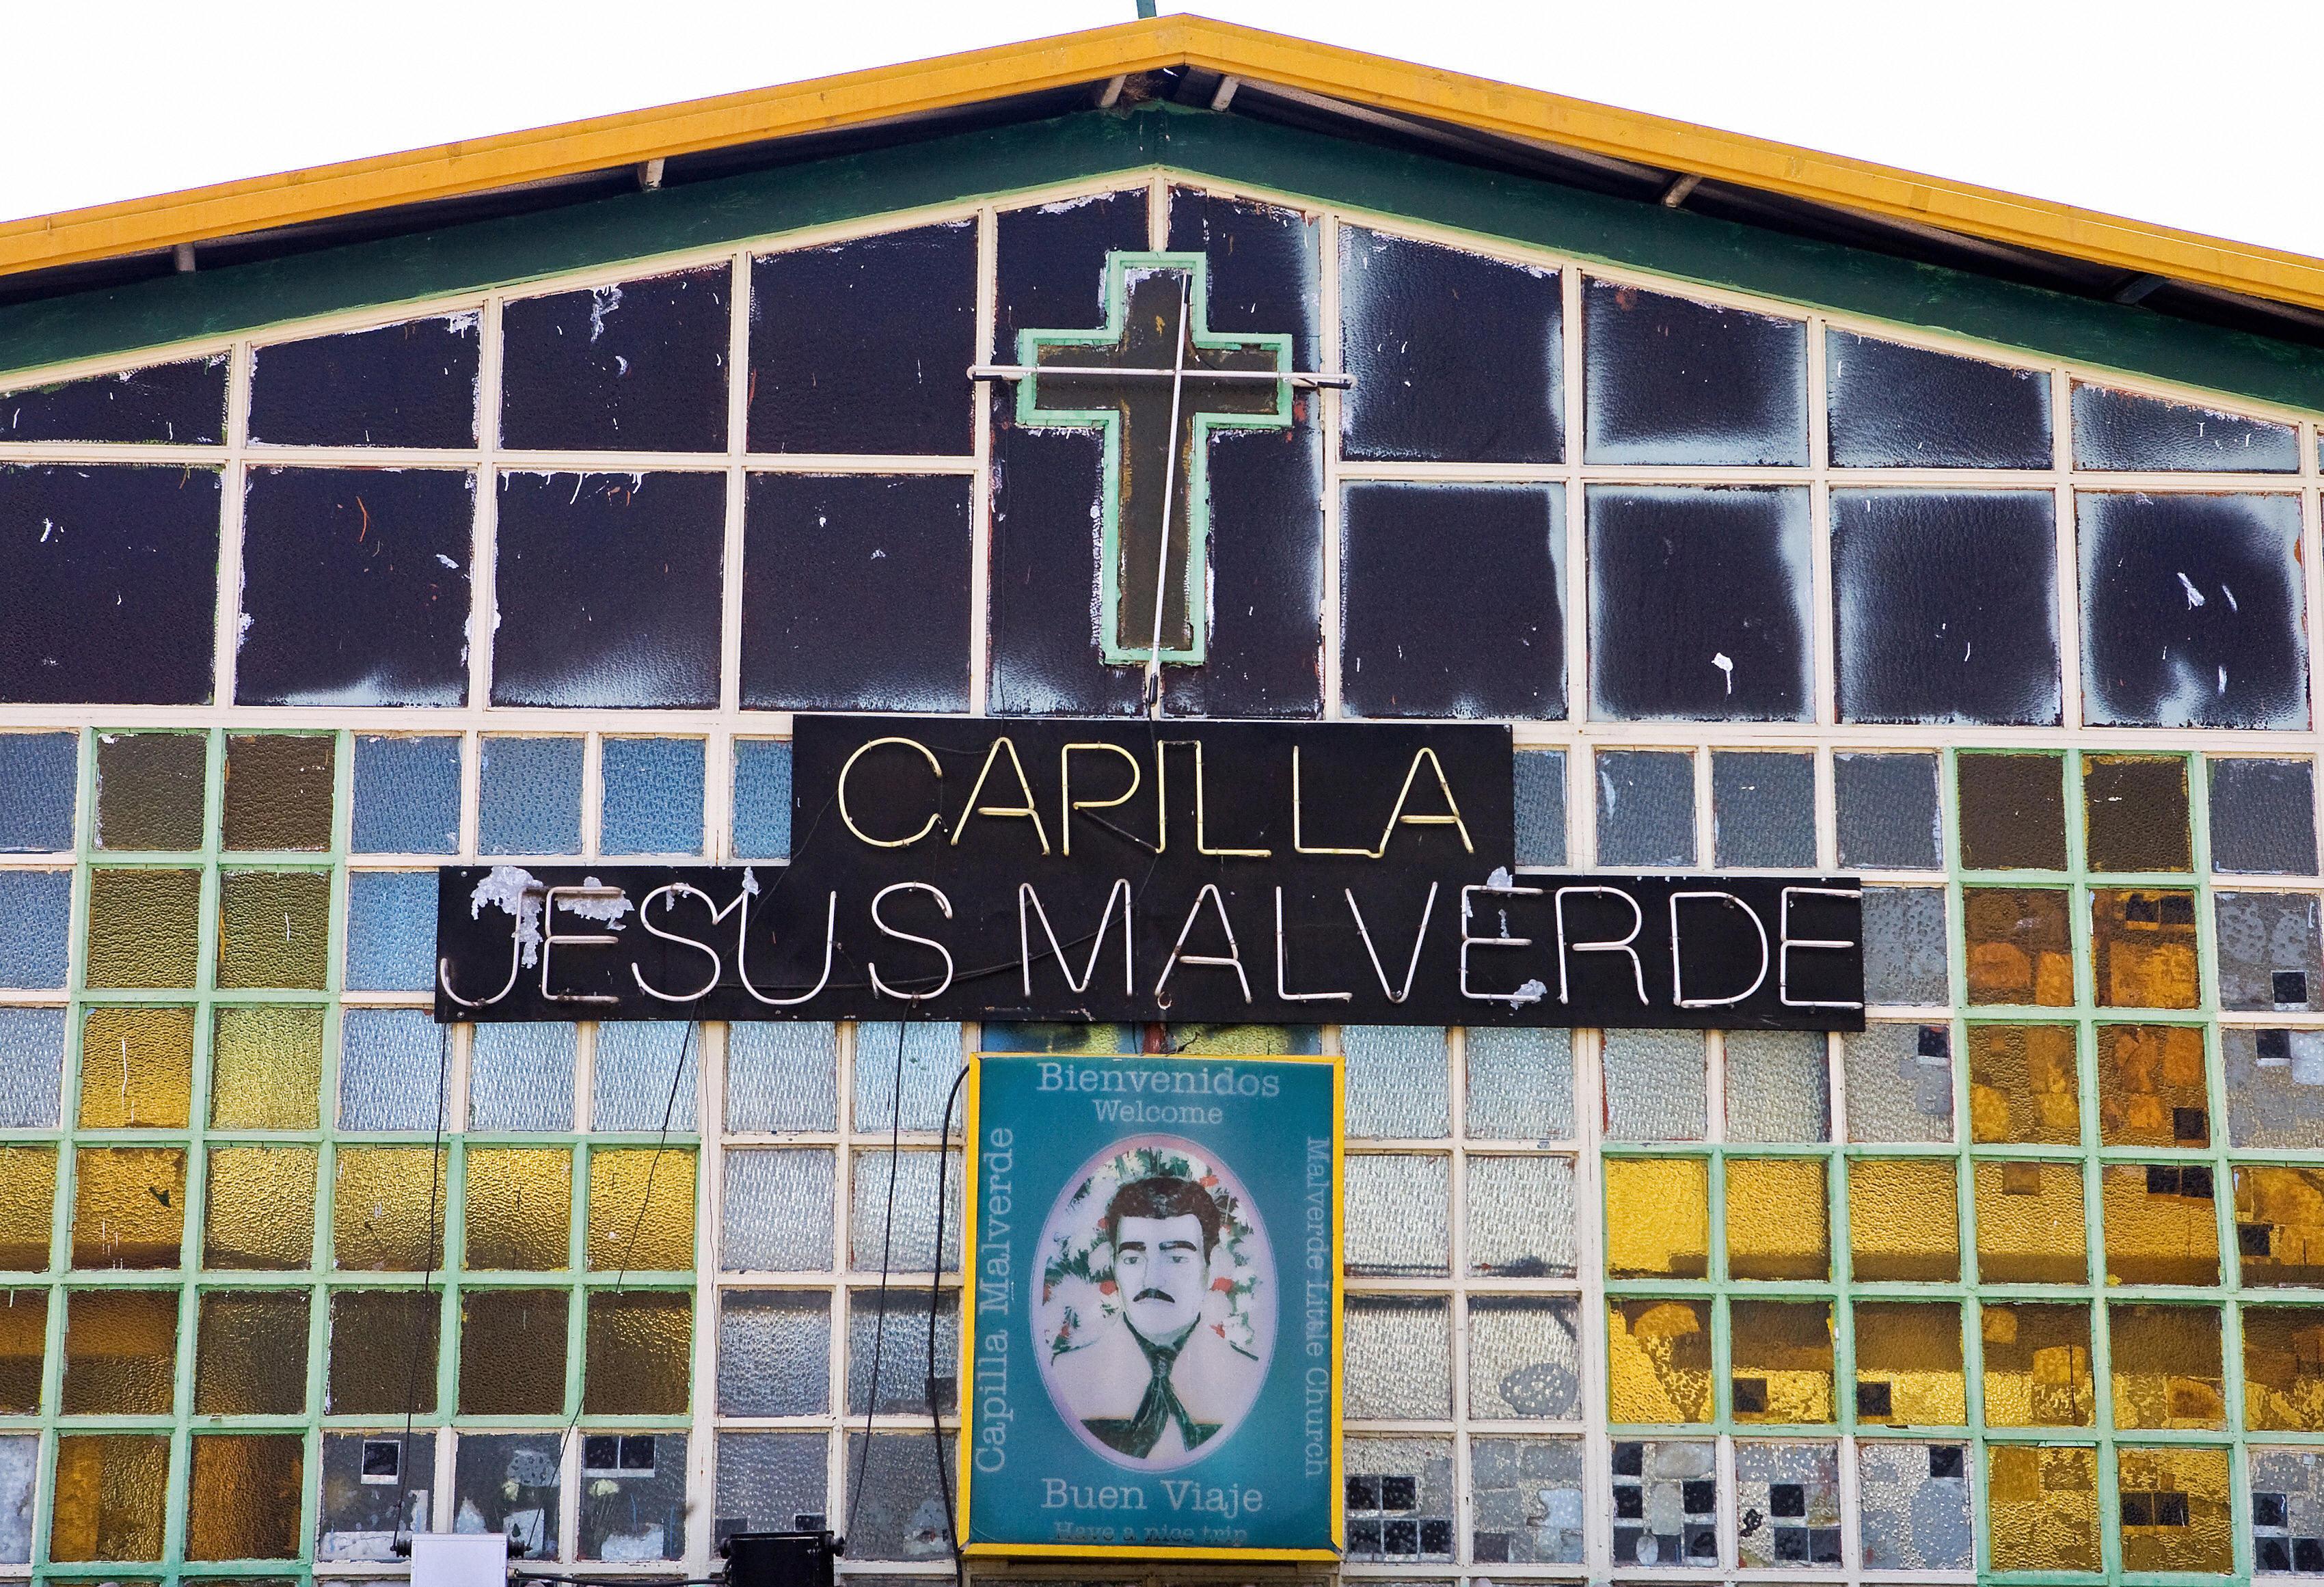 The chapel of the bandit Jesus Malverde